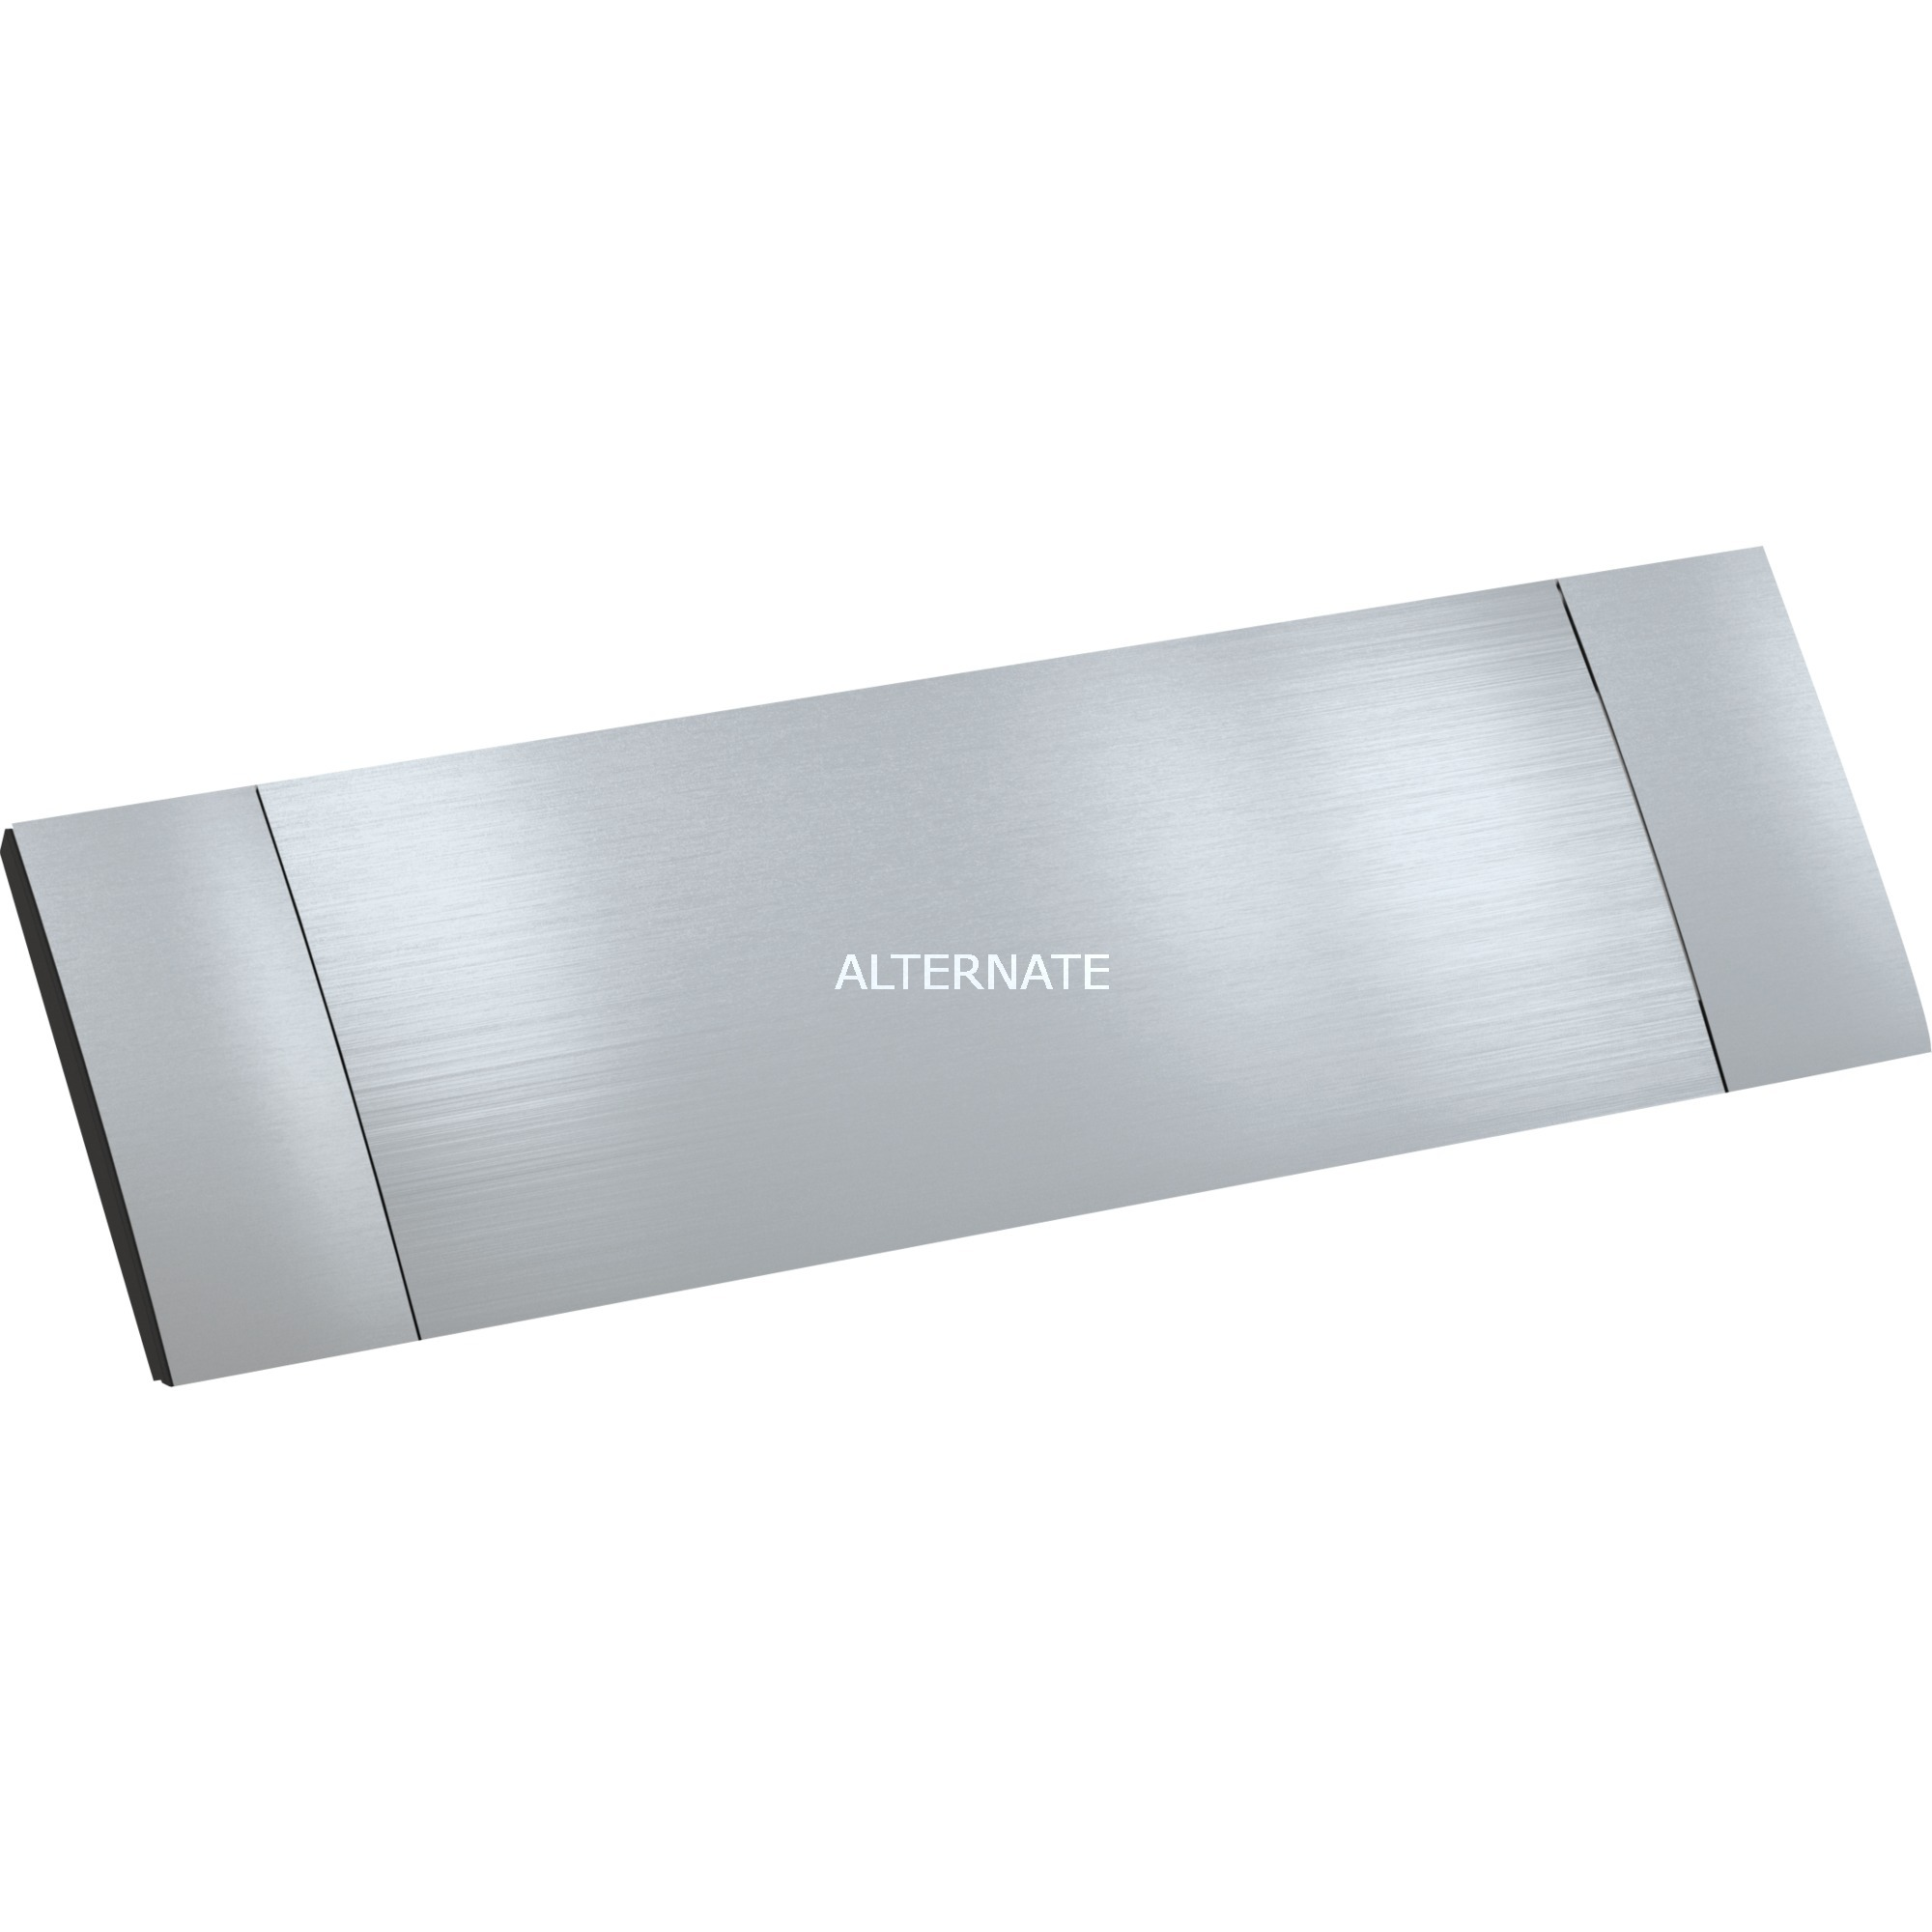 915.502 Aluminio tapa de seguridad para enchufe, Bastidor de instalación